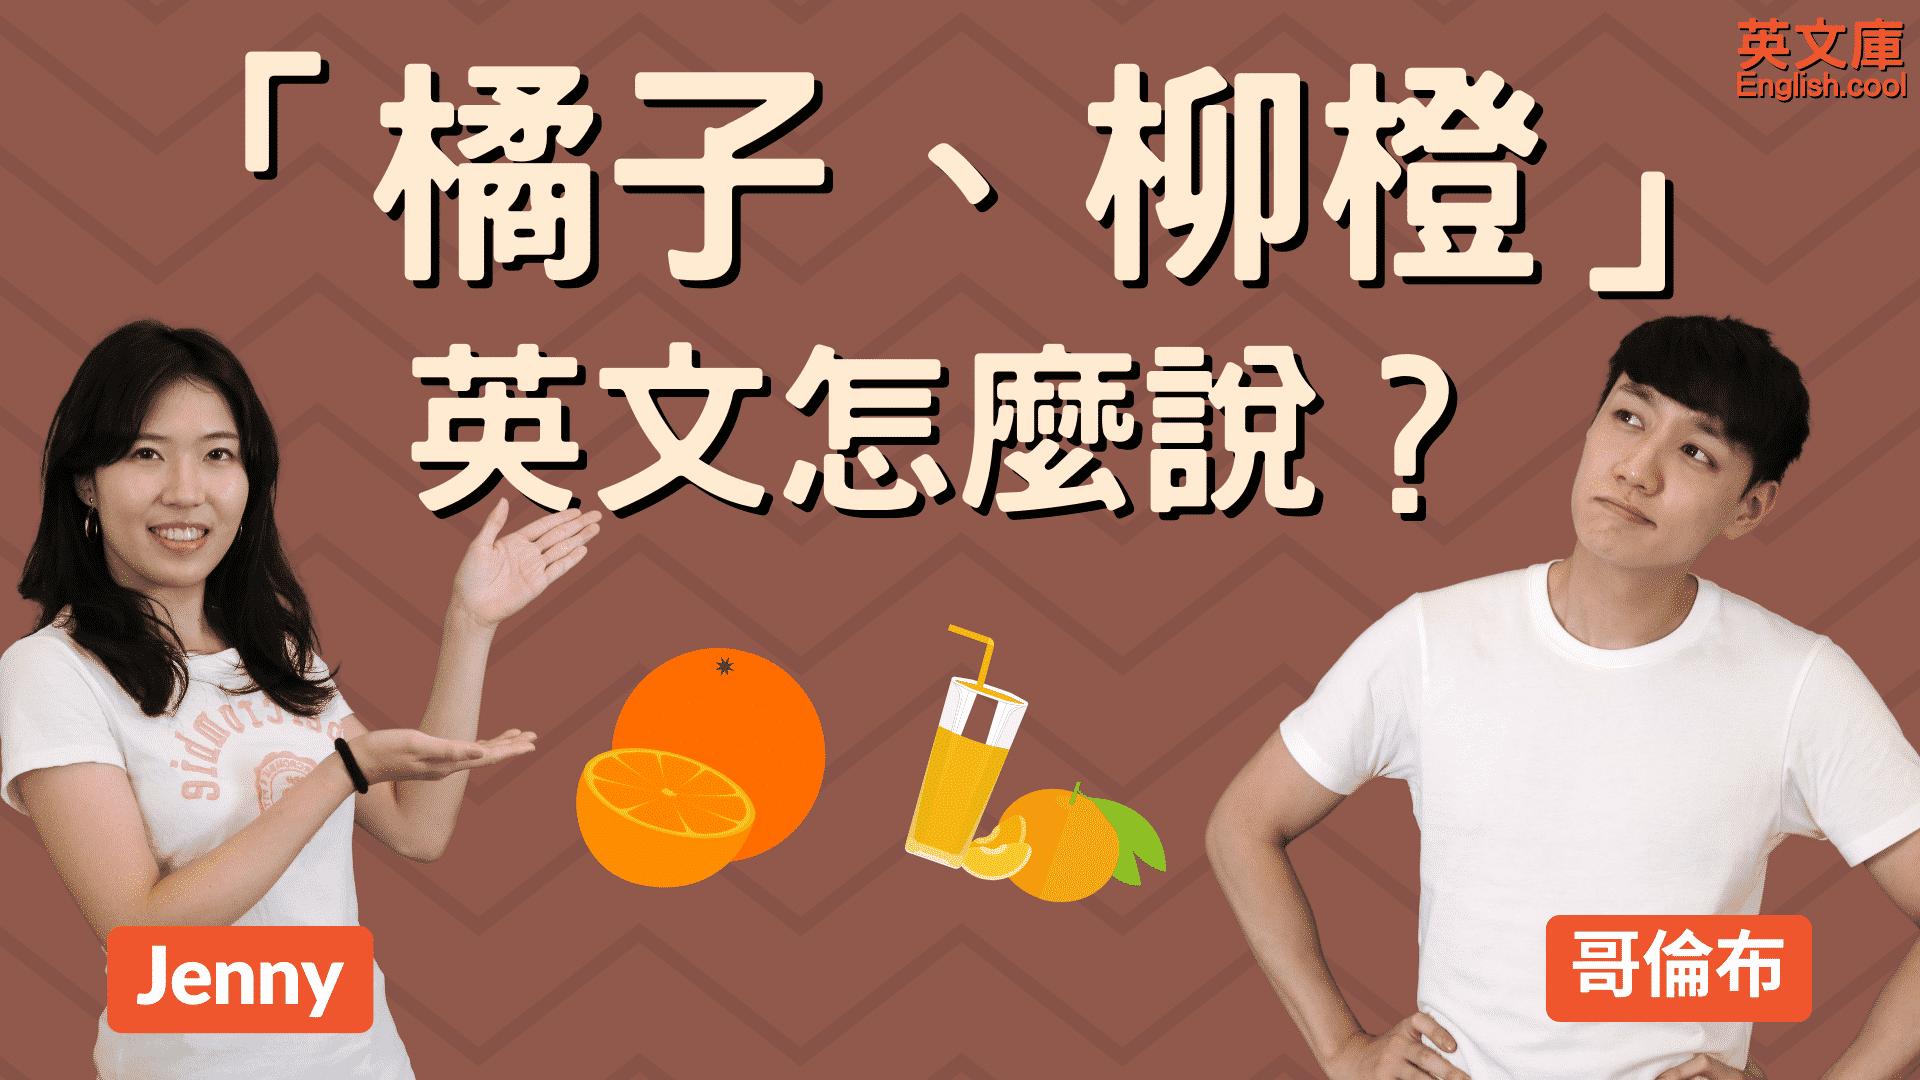 You are currently viewing 橘子、柳橙、柑橘… 等英文是? Orange? Tangerine?